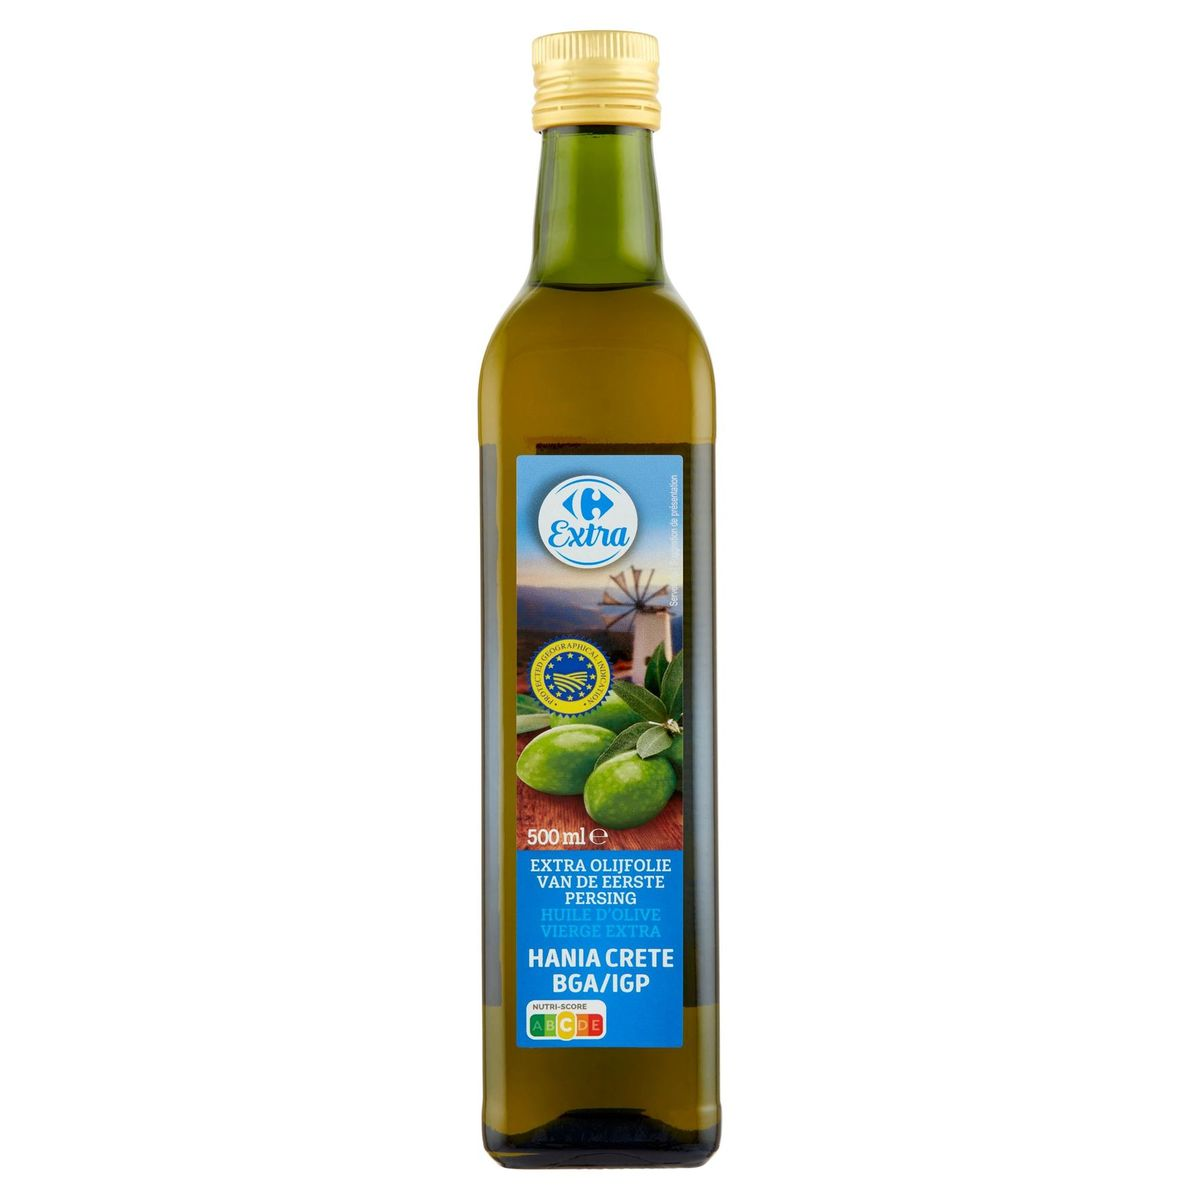 Carrefour Huile d'Olive Hania Crète IGP Vierge Extra 500 ml